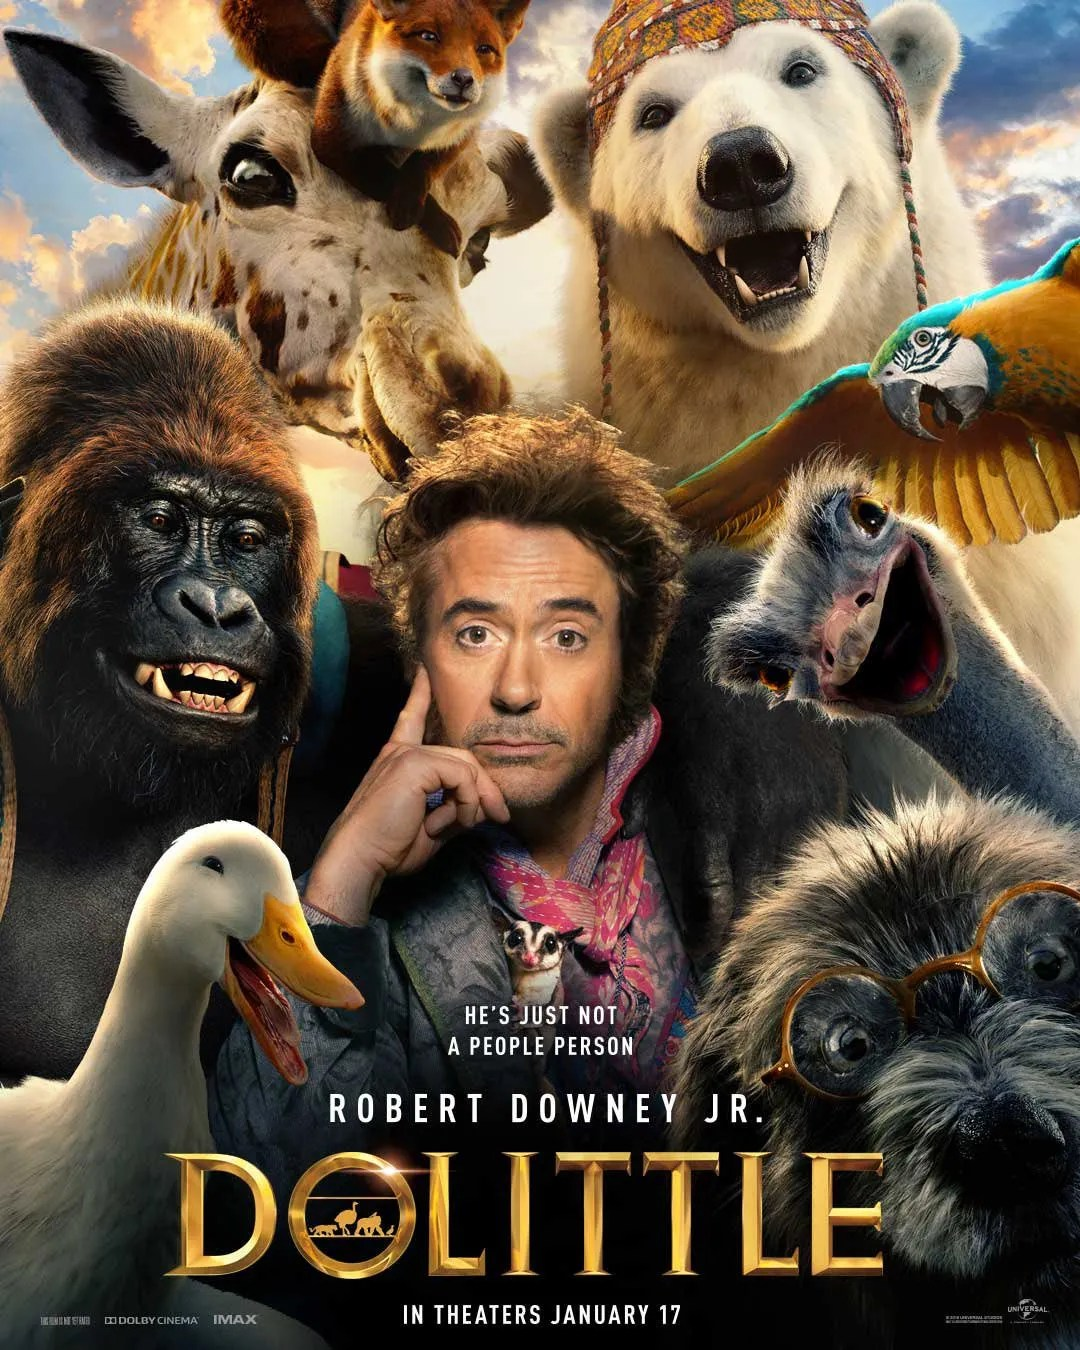 Póster de Dolittle (2020). Imagen: Universal Pictures Twitter (@UniversalPics).